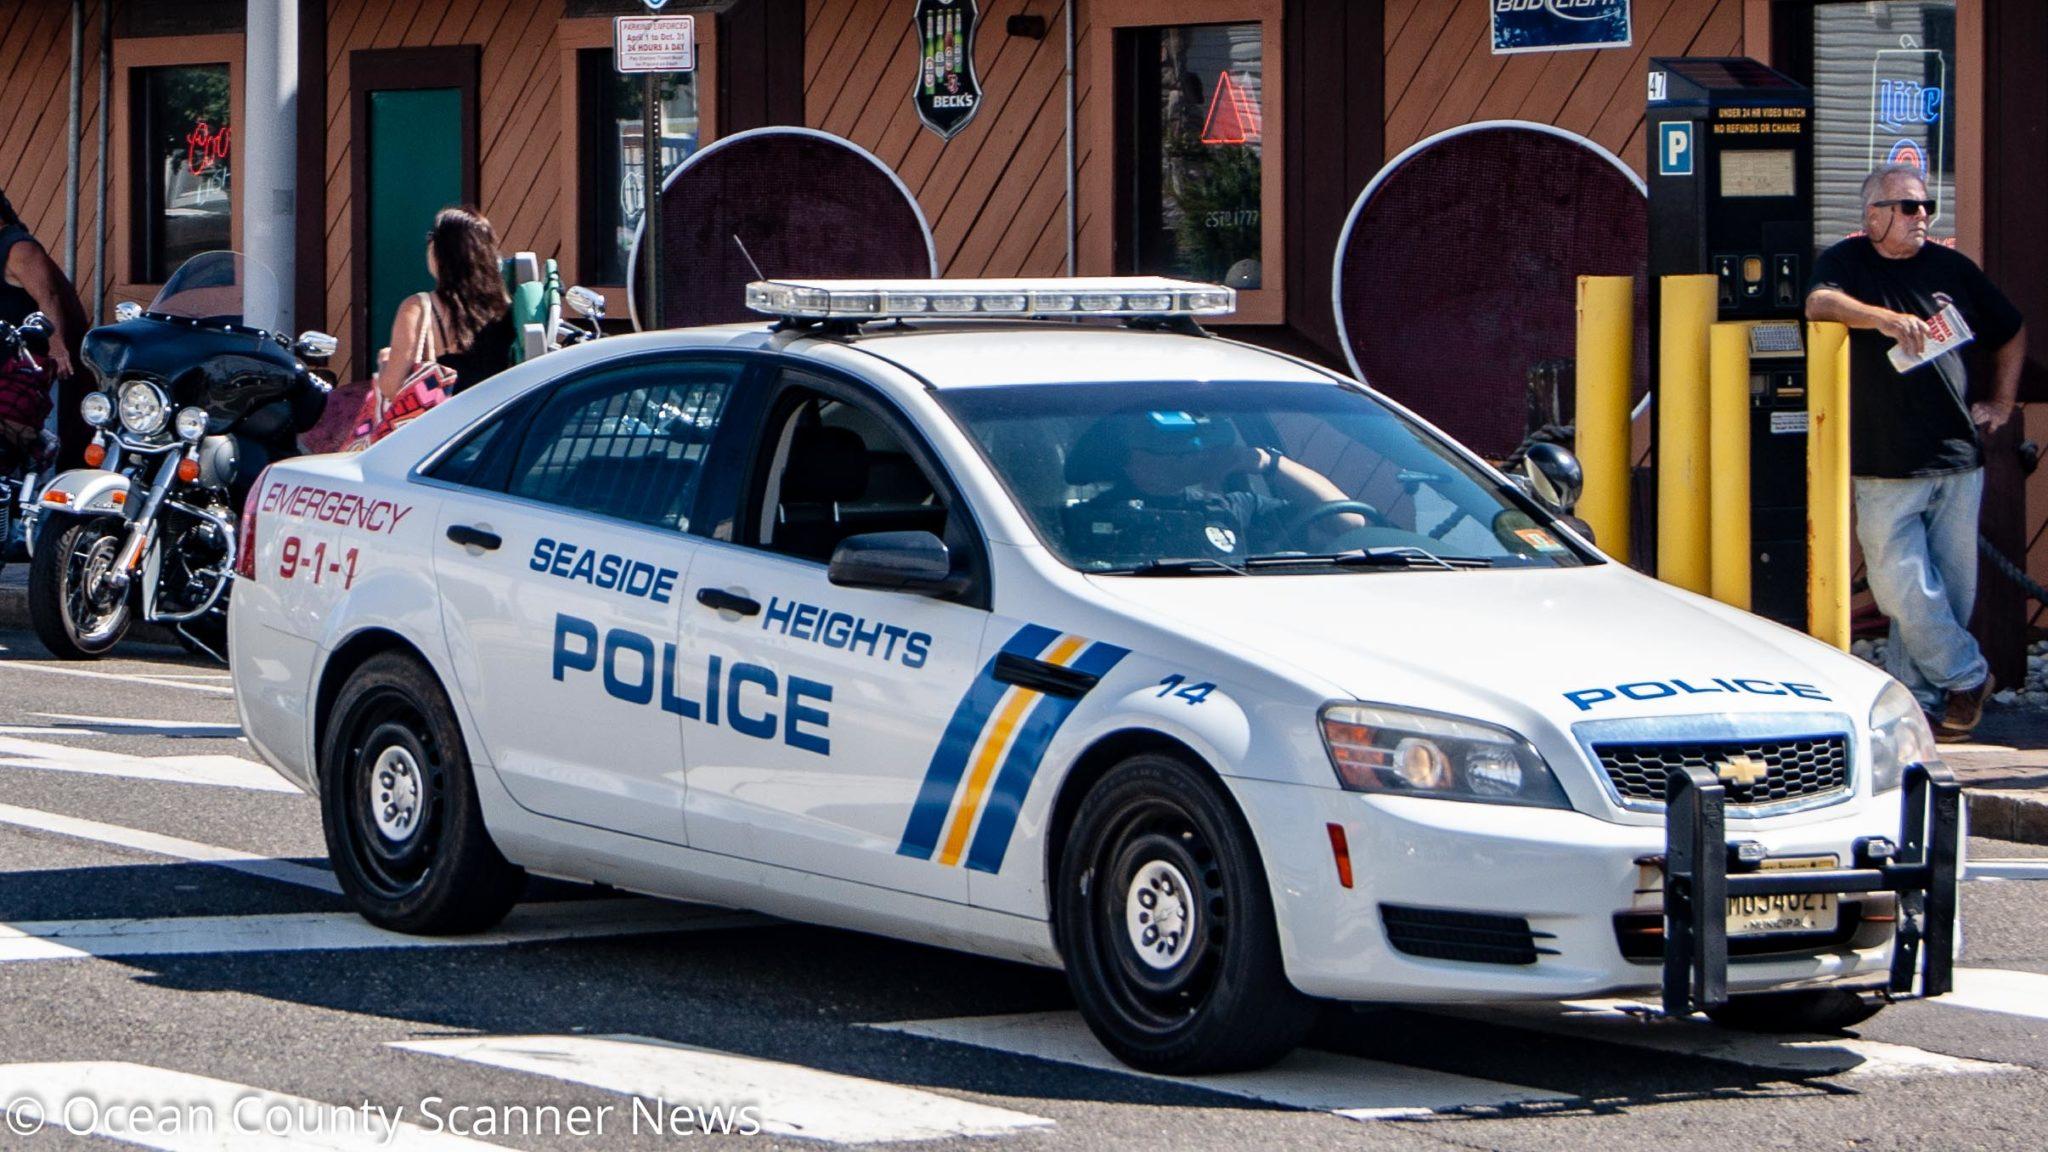 SSP: Shooting Investigation Update